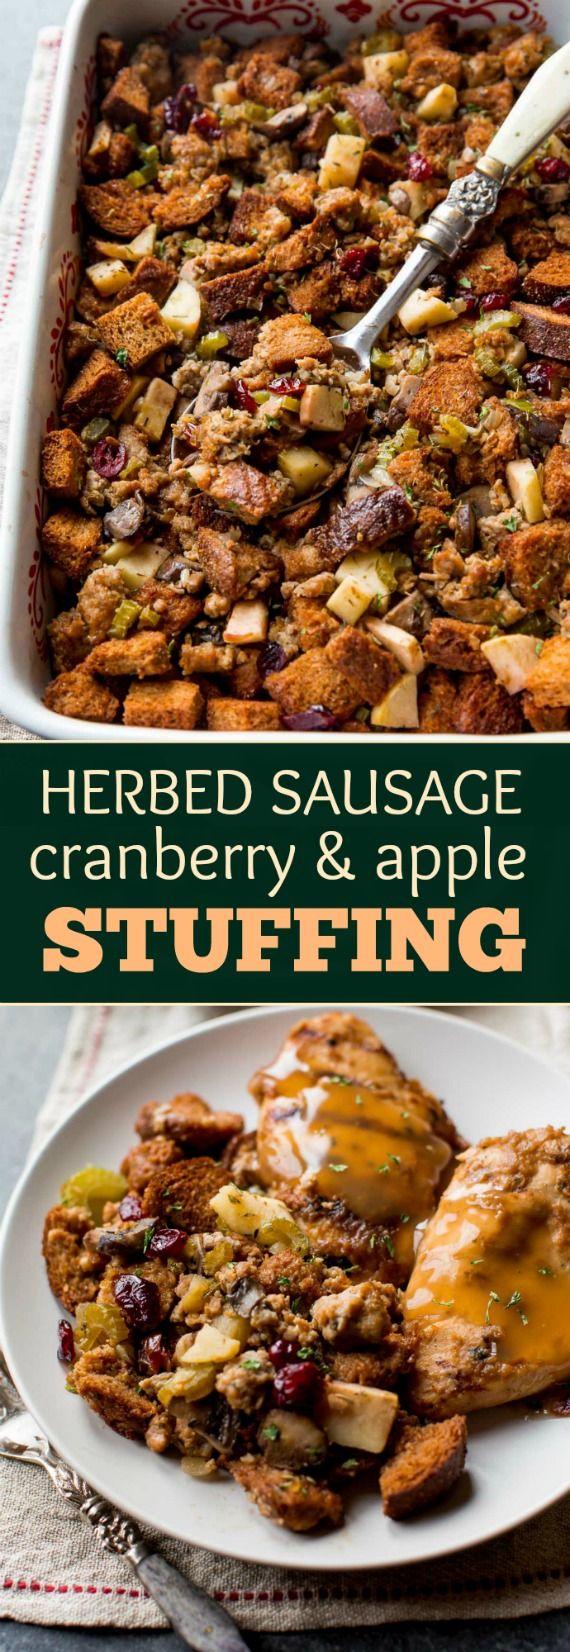 Thanksgiving stuffing with sausage, lots of savory herbs, sweet apples, sausage, and mushrooms! Make ahead side dish. Recipe on sallysbakingaddiction.com